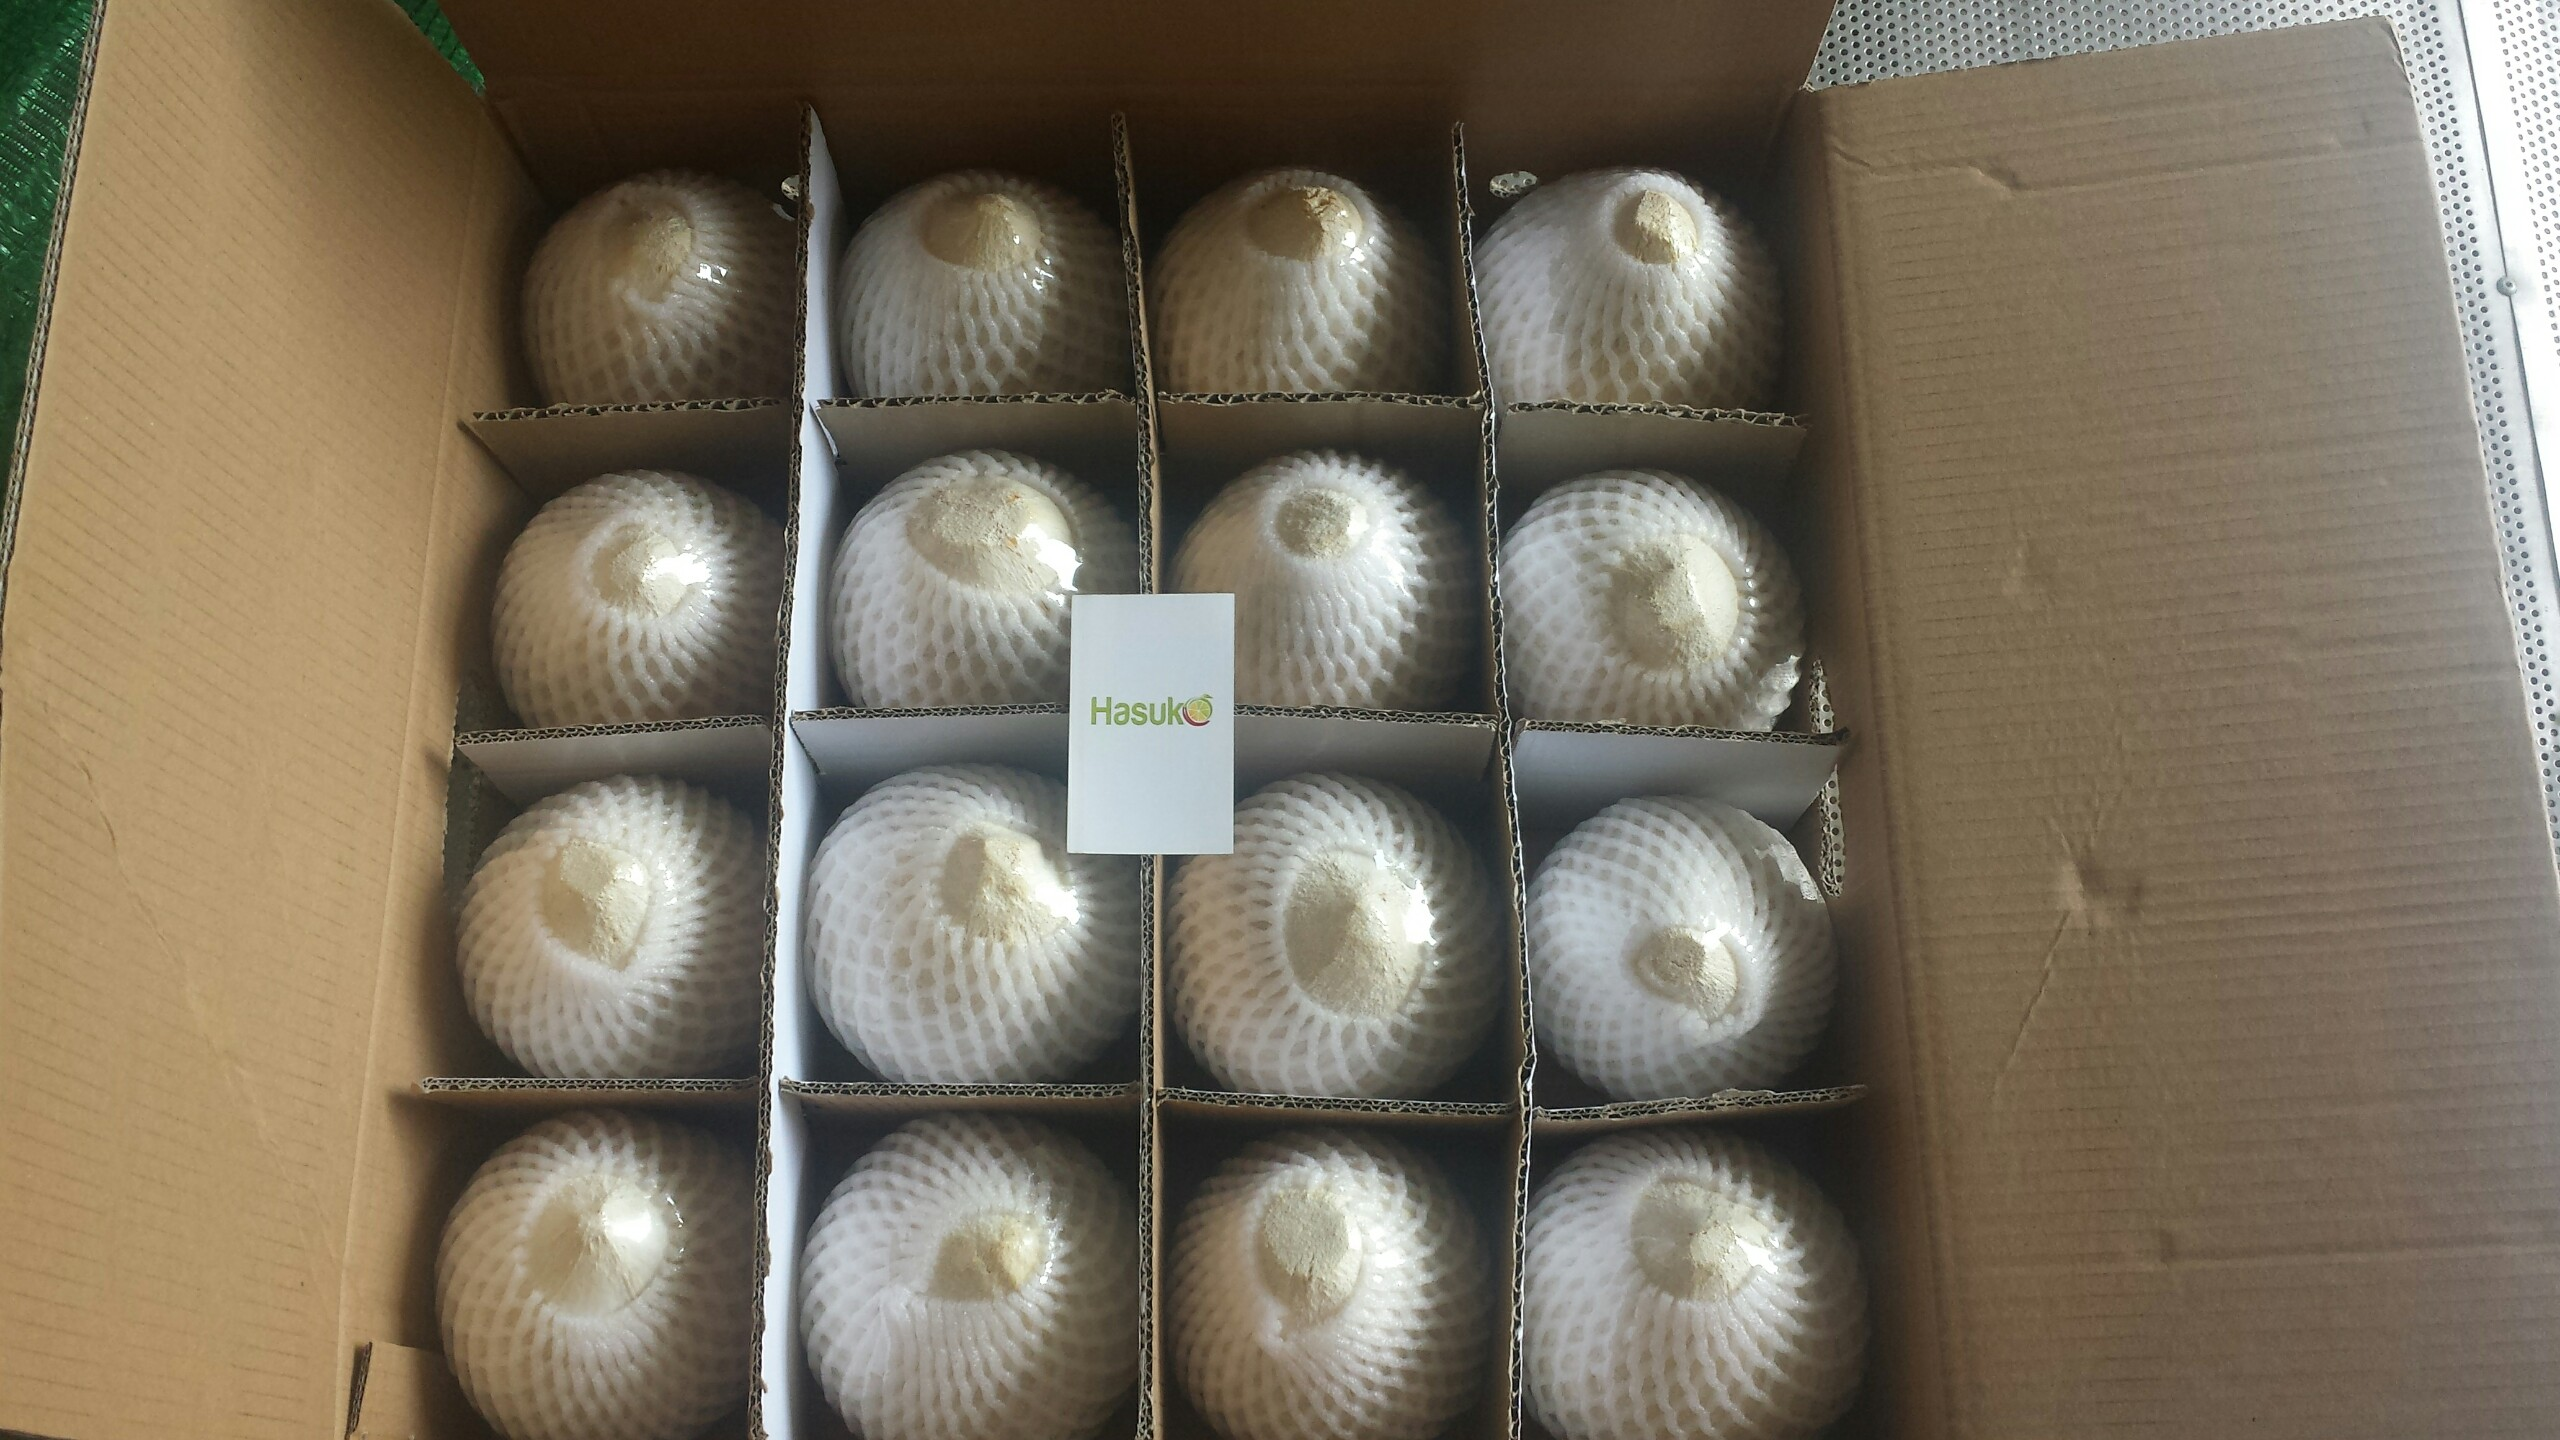 Fresh diamond/ polish coconut (84)1669868008